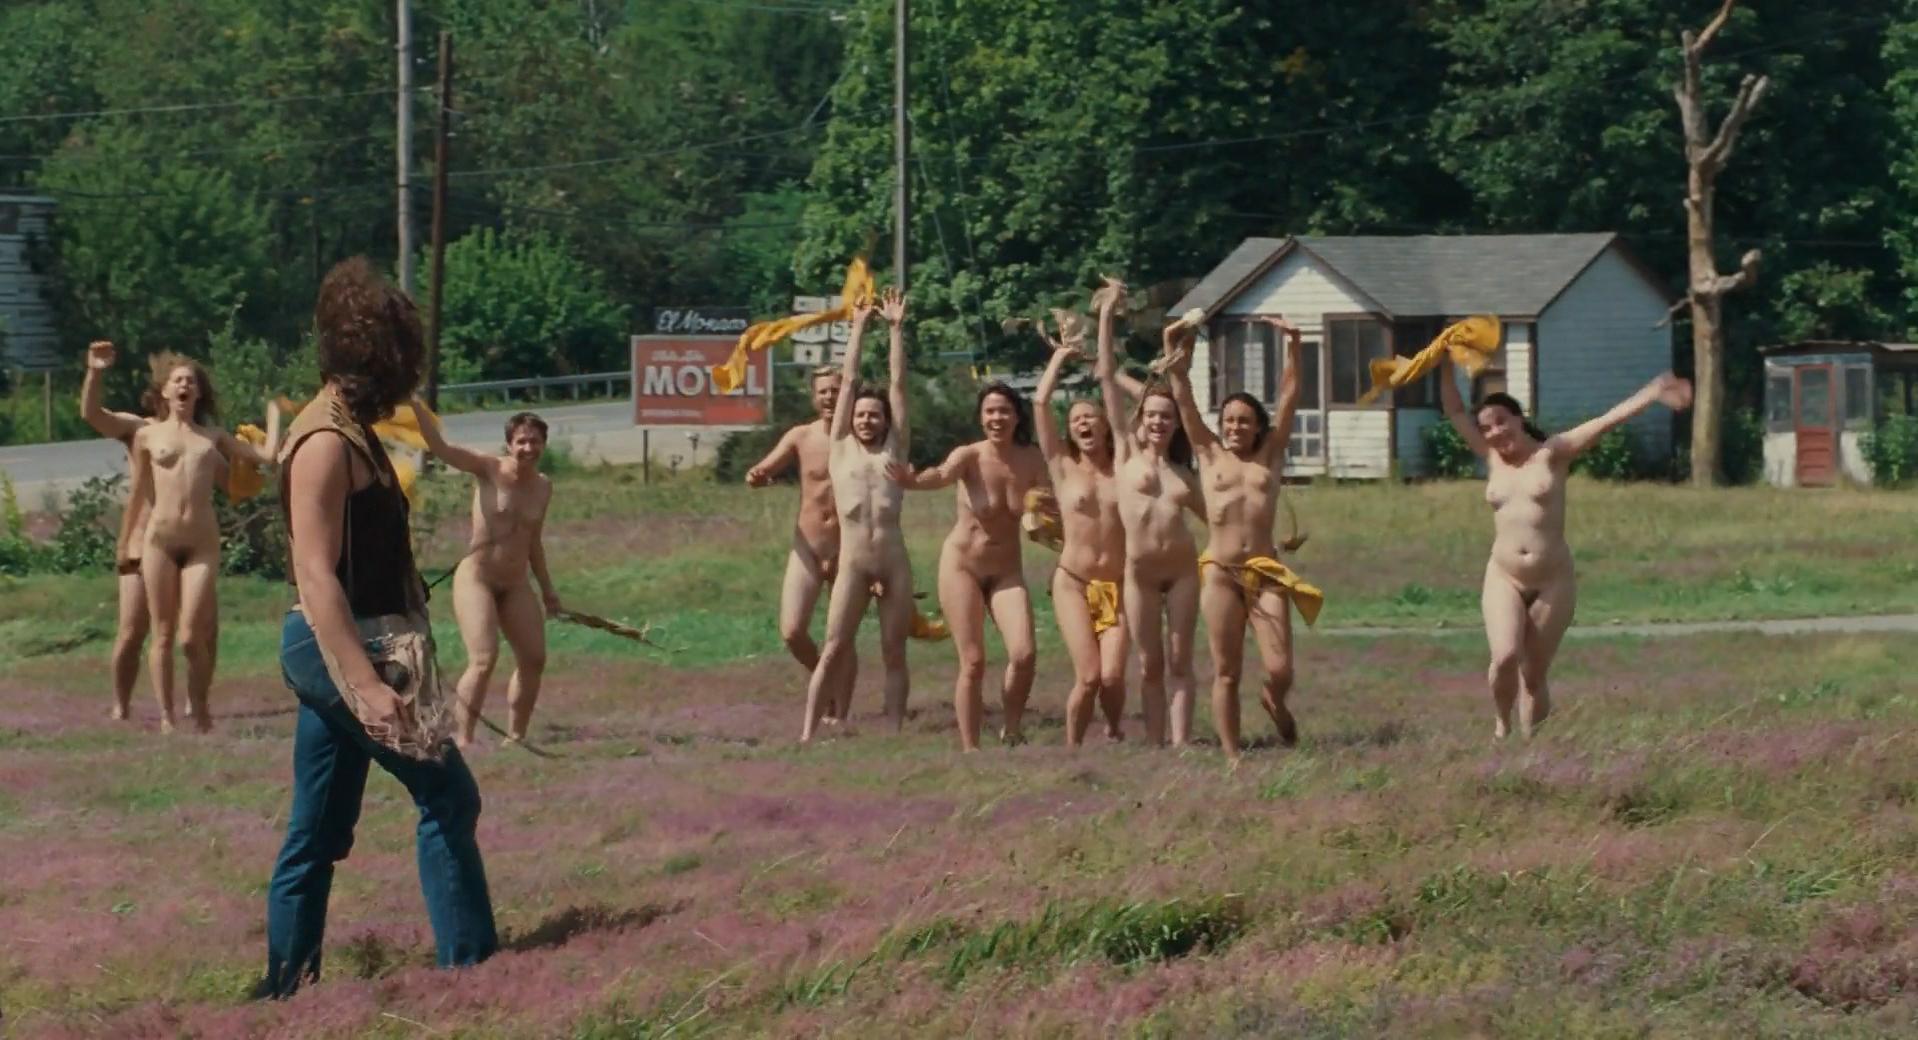 Eva de dominici nude scenes compilation on scandalplanetcom - 2 part 10